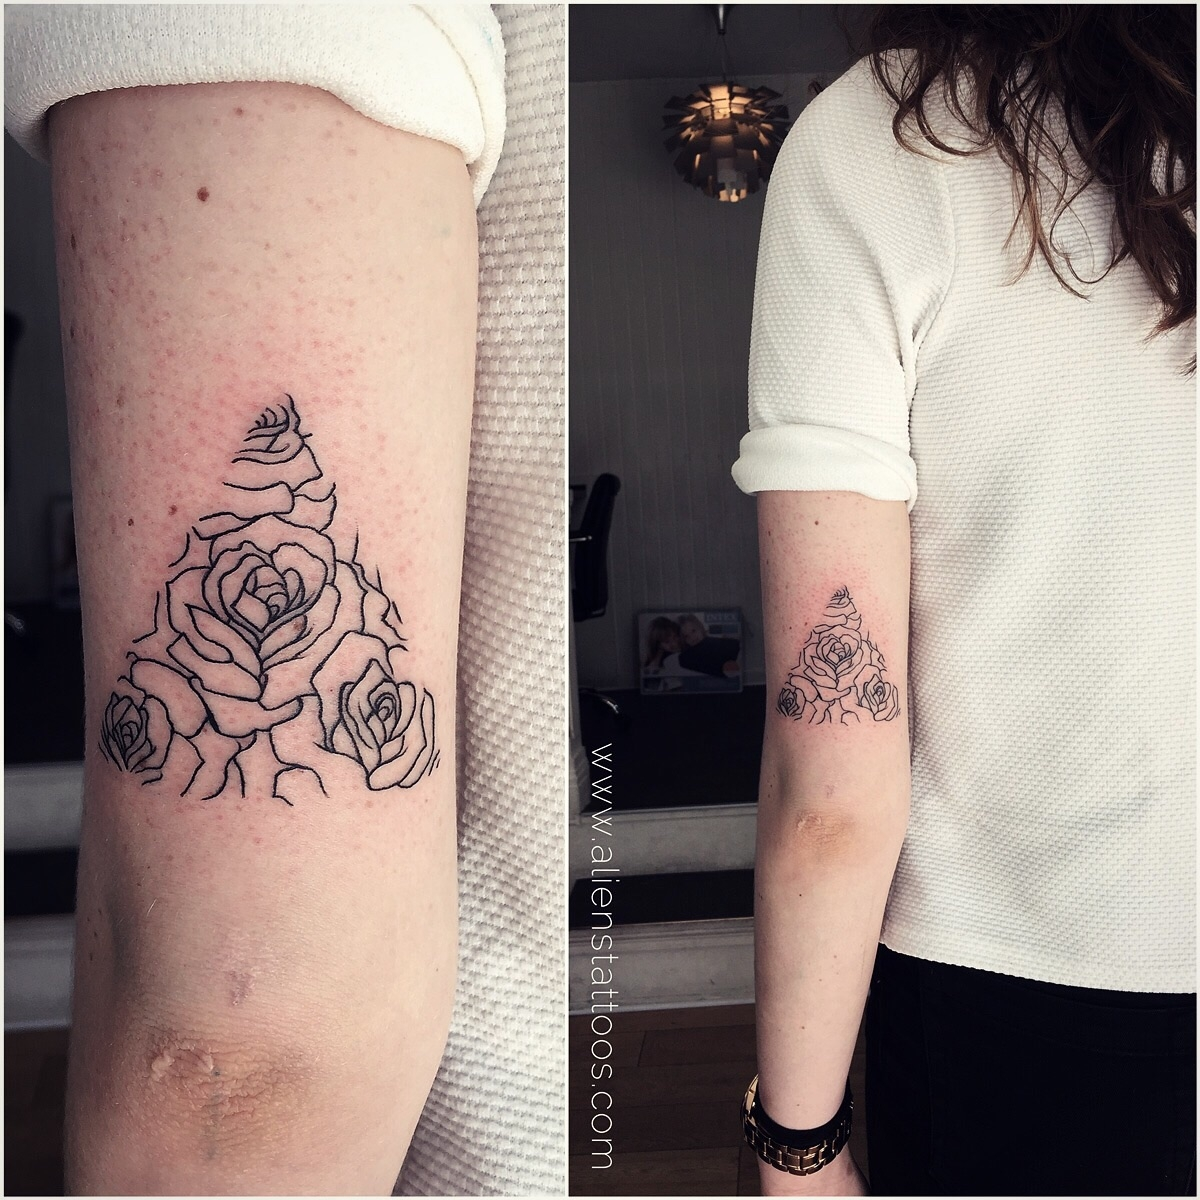 line-art rose tattoo